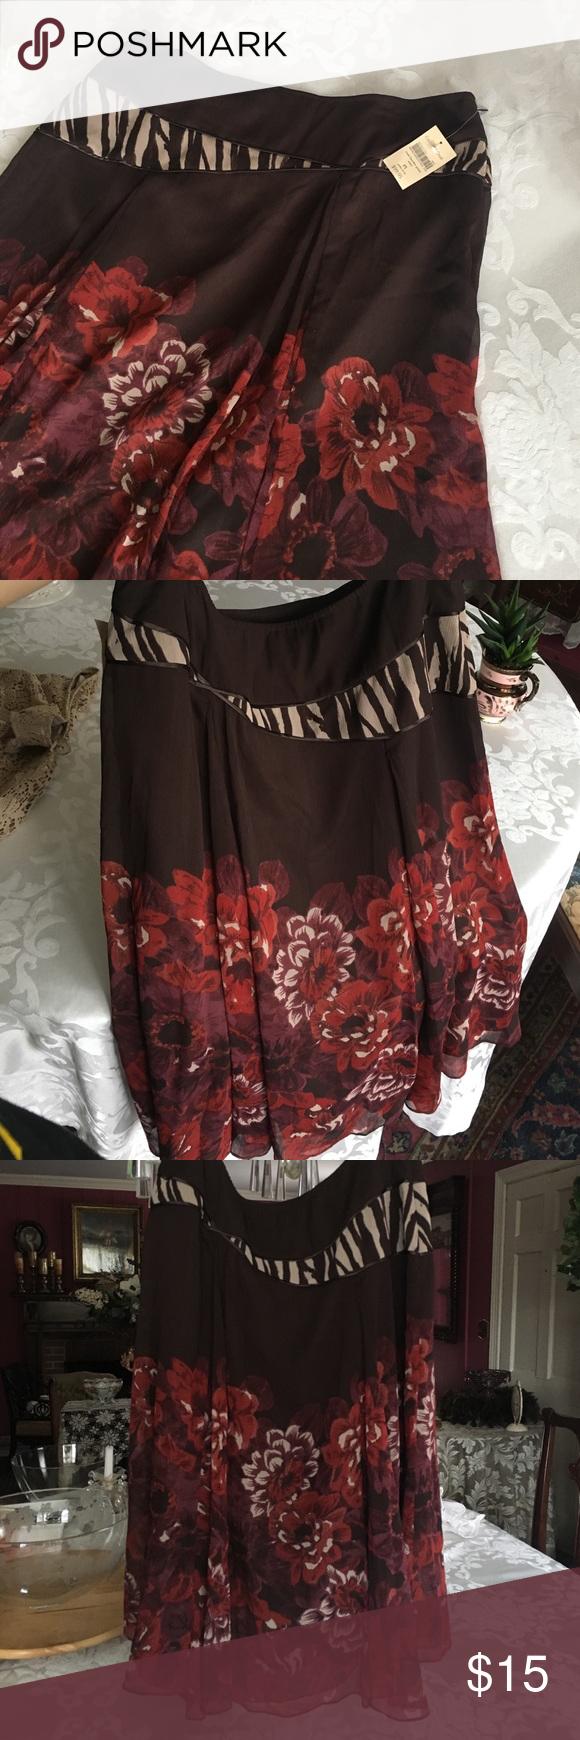 Coldwater Creek Skirt NWT rose border print skirt, Petite 14-16 Coldwater Creek Skirts